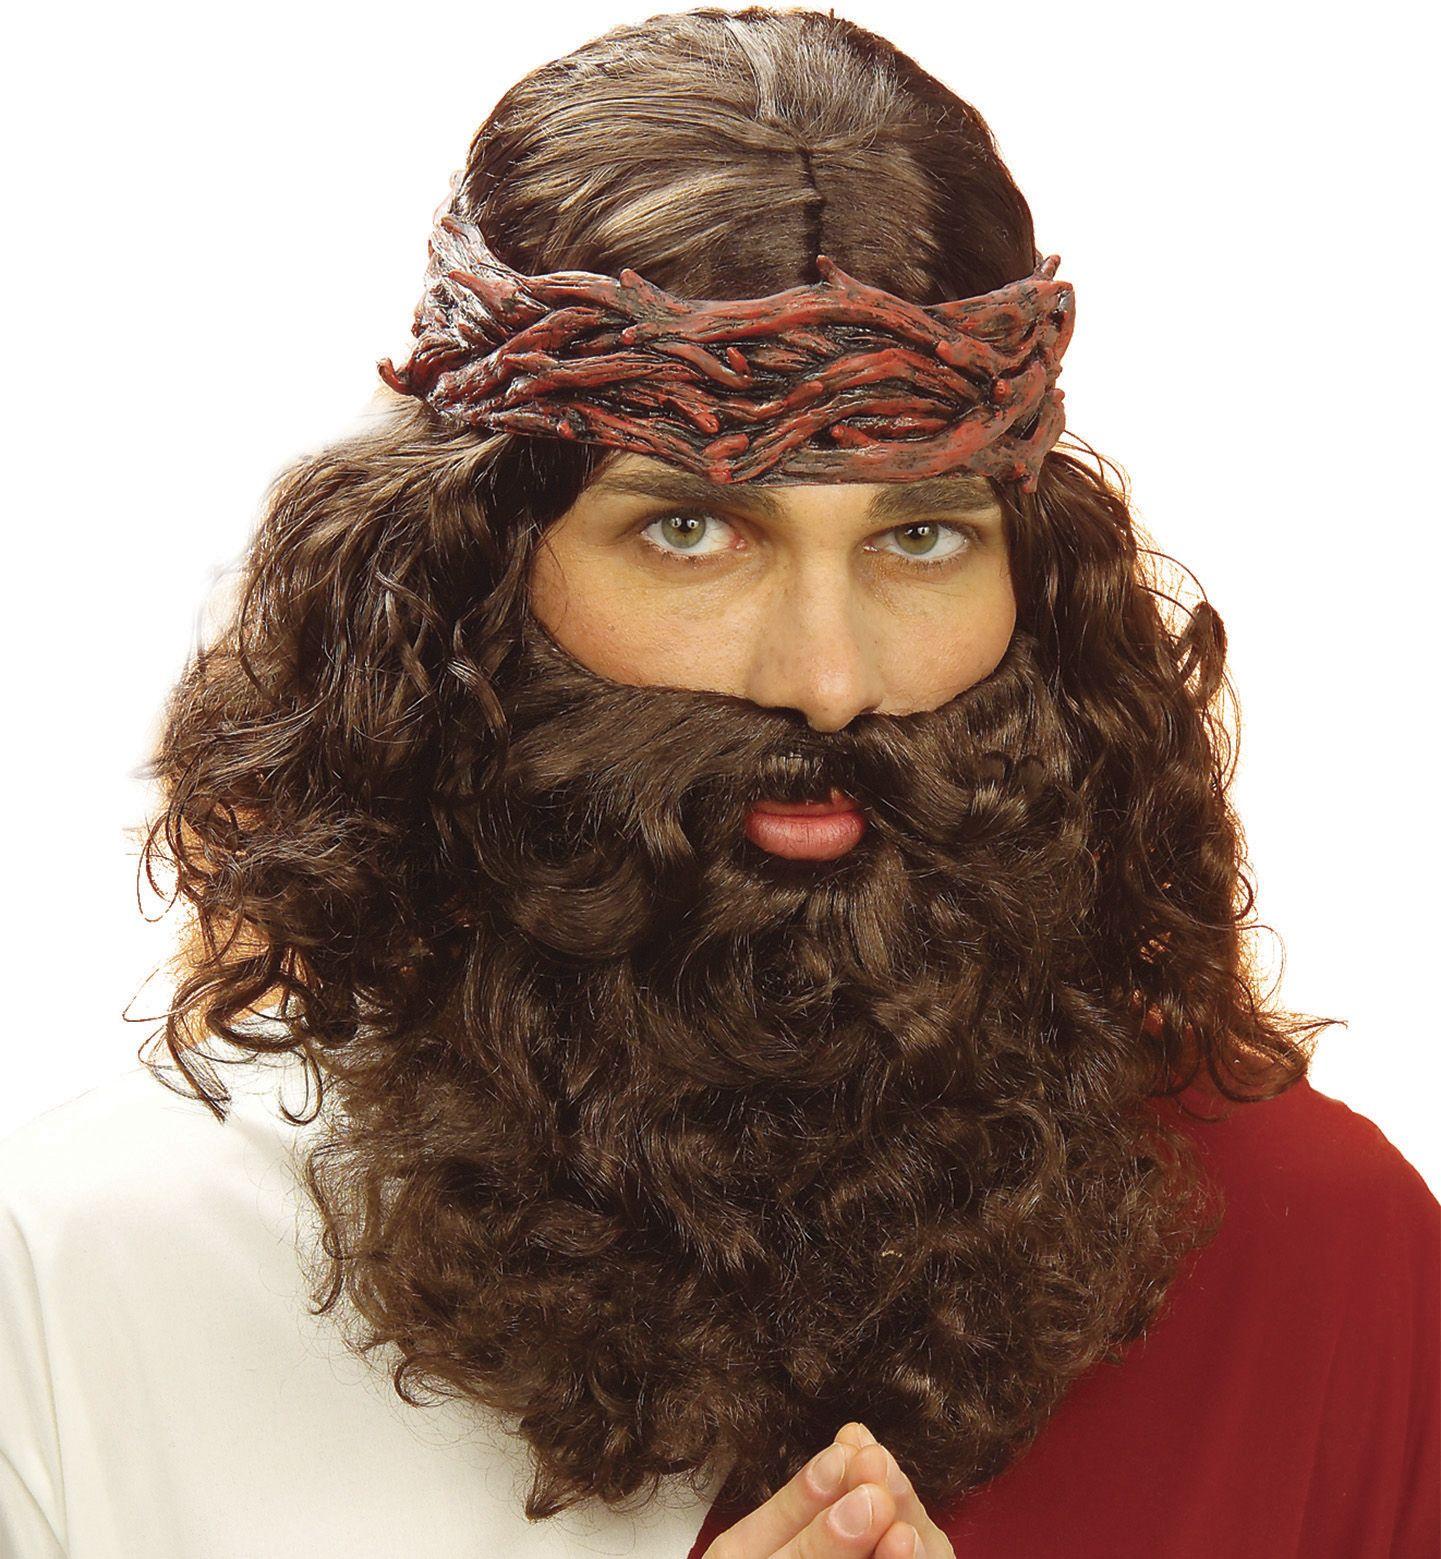 Bruine profeet pruik met baard